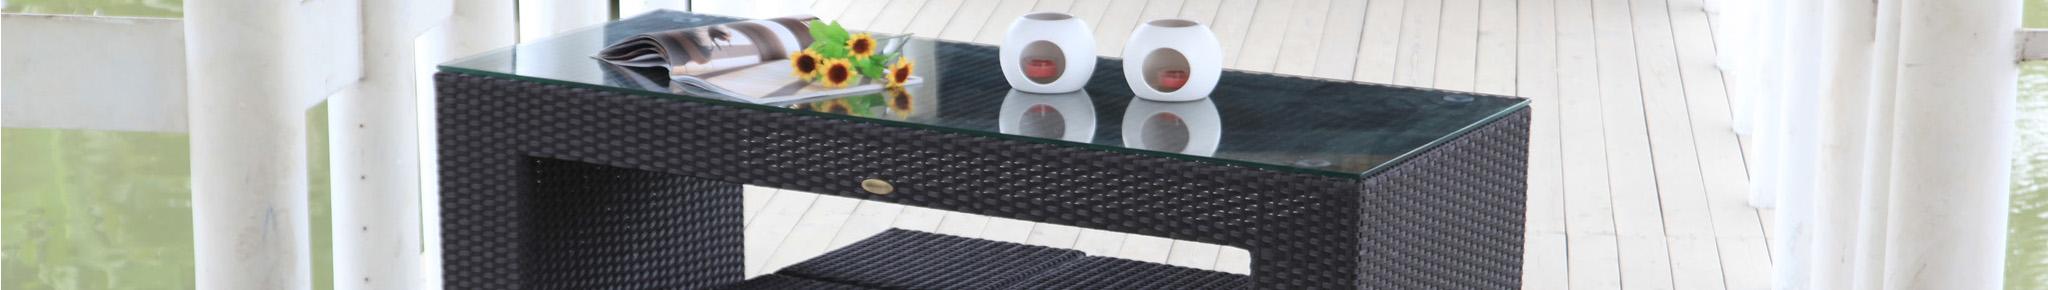 Rattan lounge schwarz grau  Nauhuri.com | Rattan Lounge Schwarz Grau ~ Neuesten Design ...